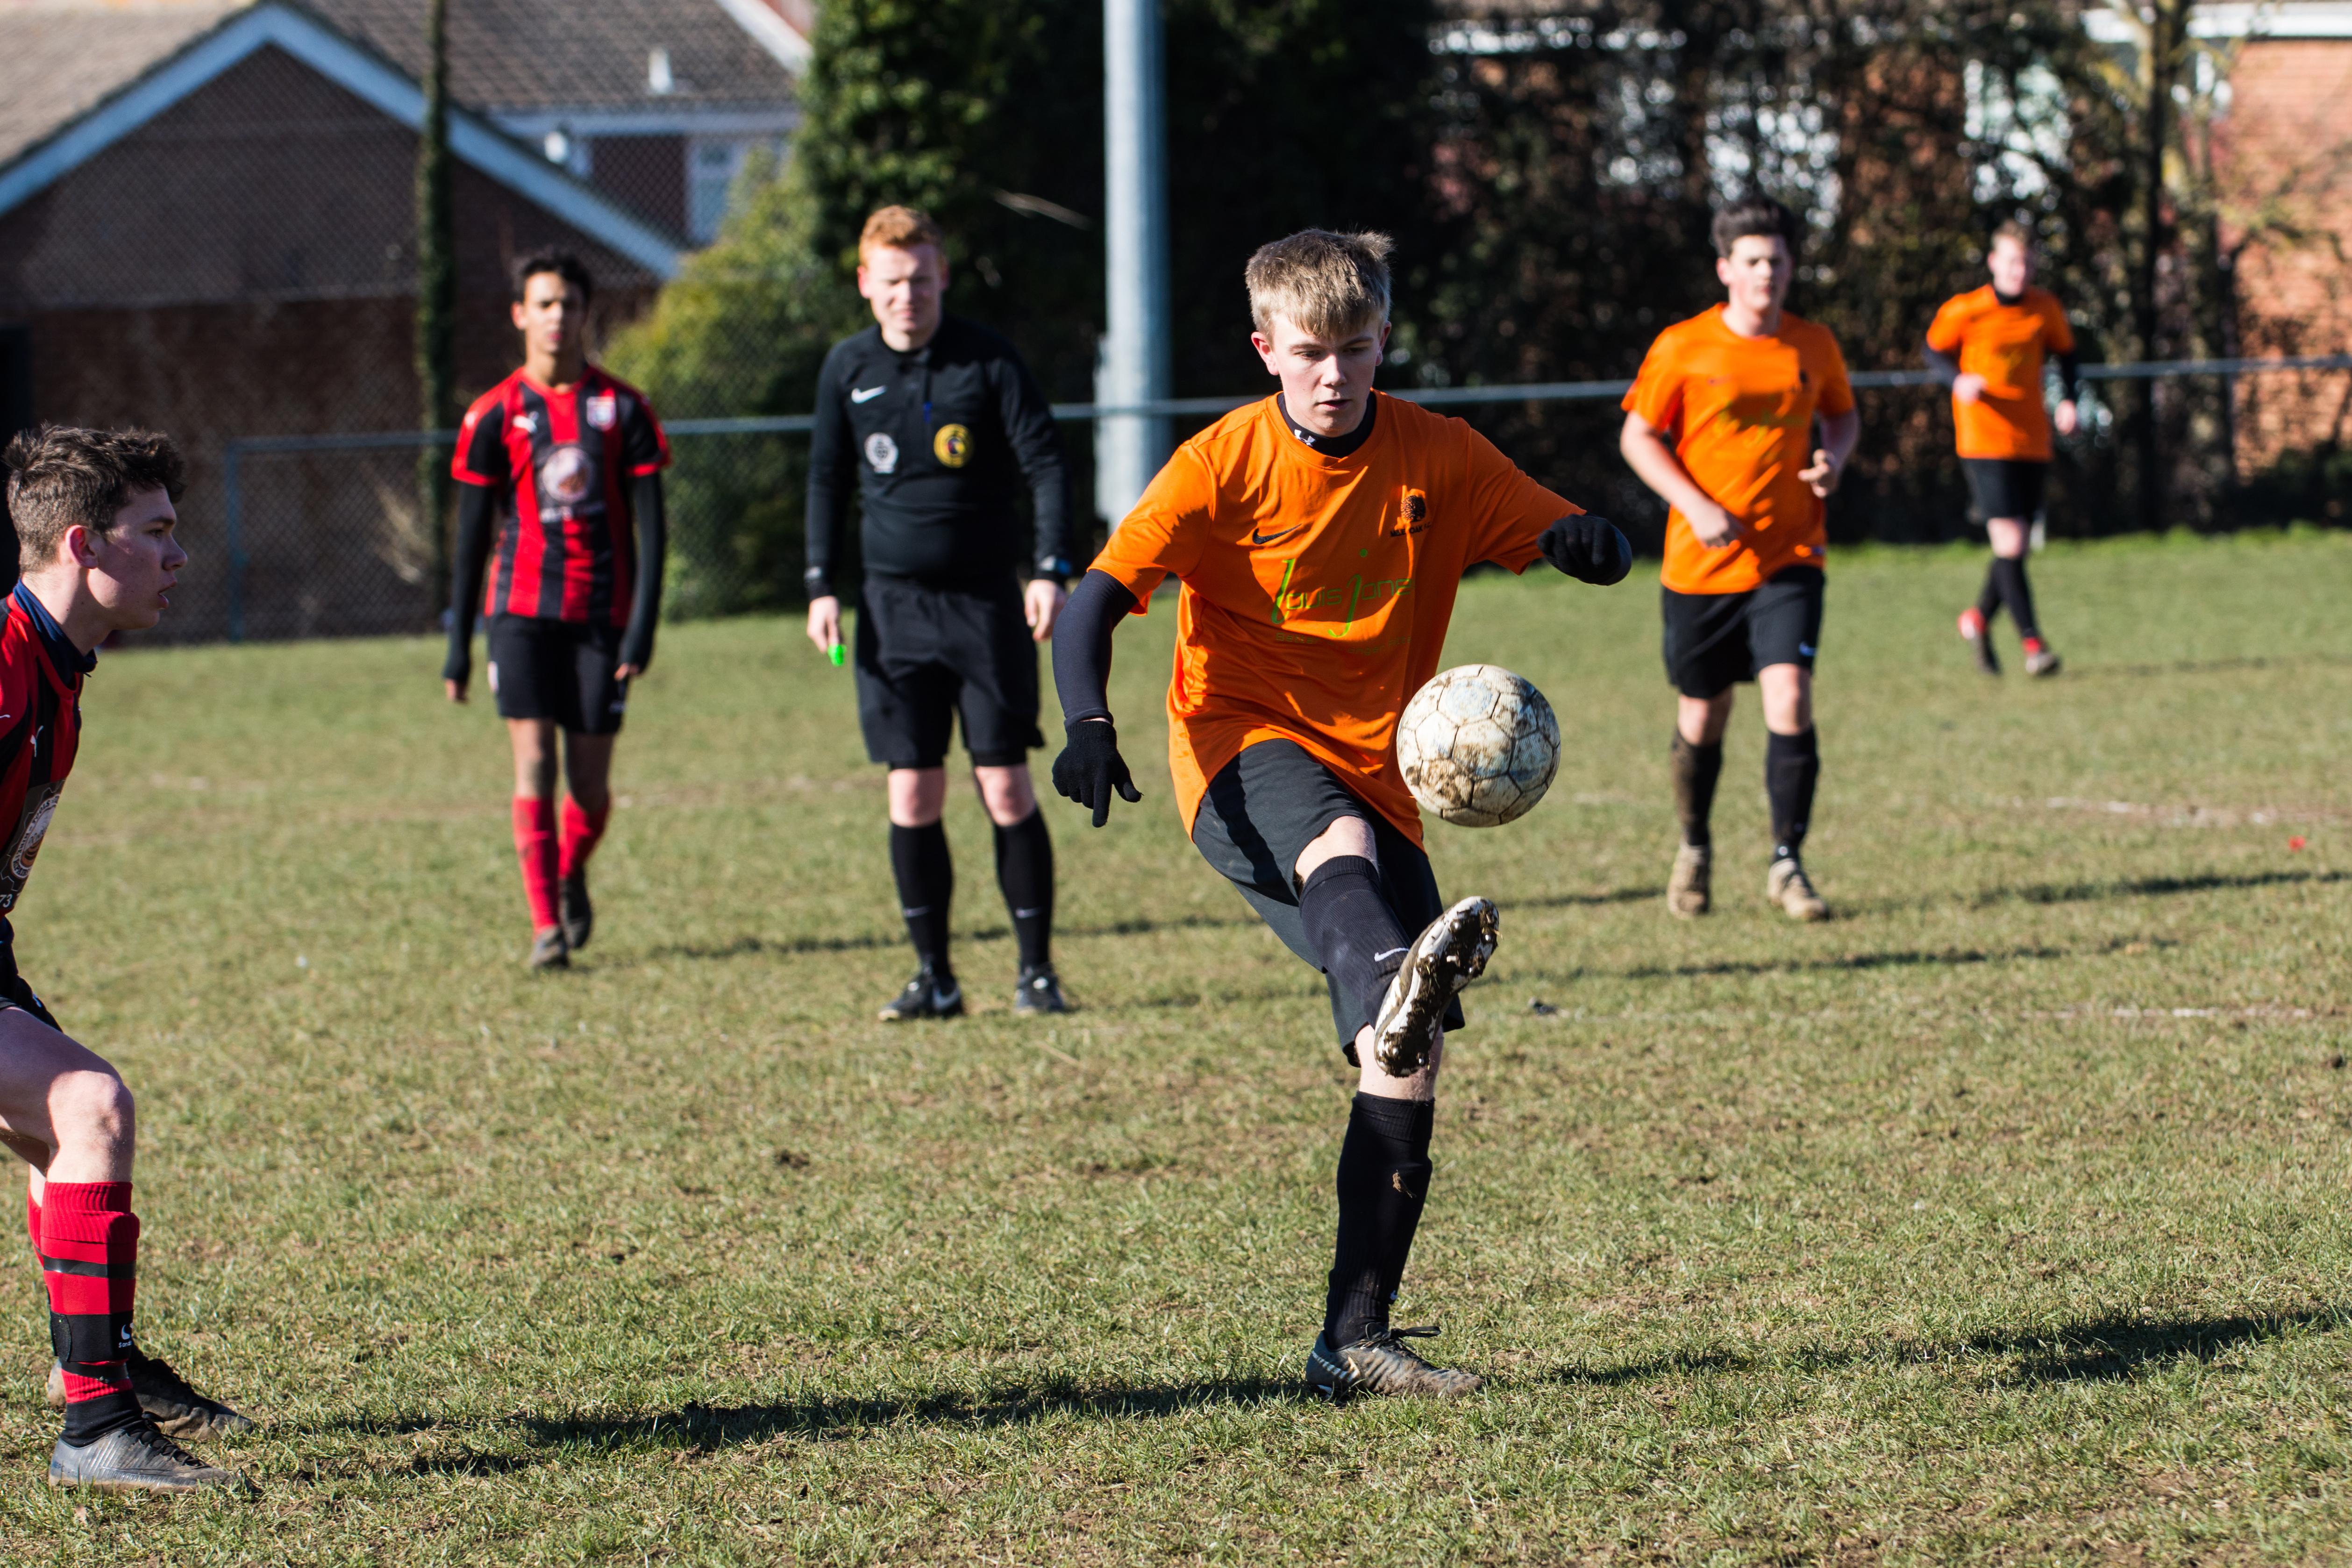 Mile Oak FC U18s vs Southwick FC U18s 25.02.18 09 DAVID_JEFFERY